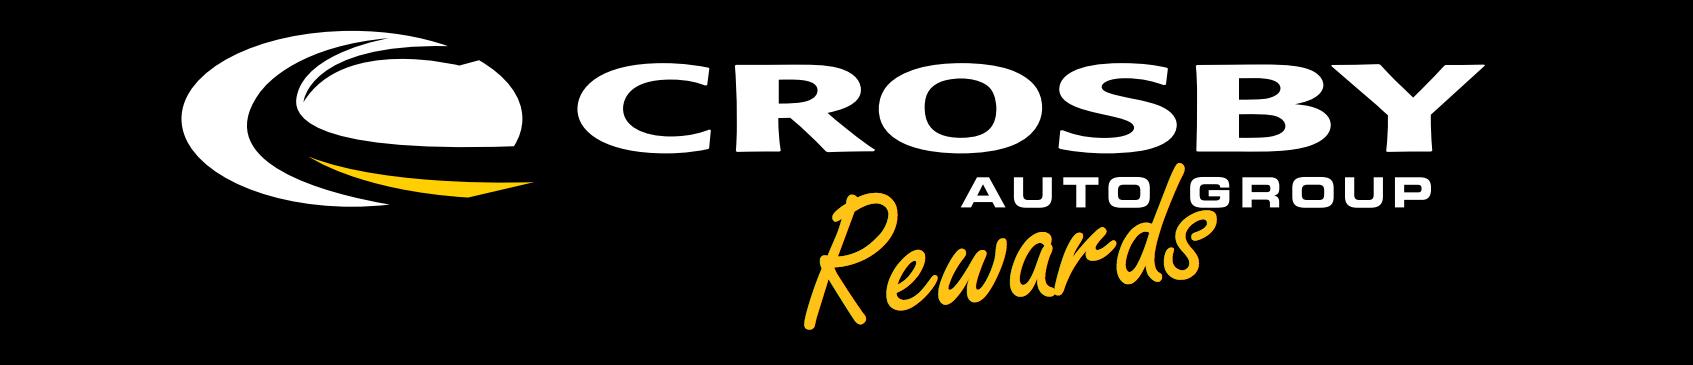 crossby-rewards